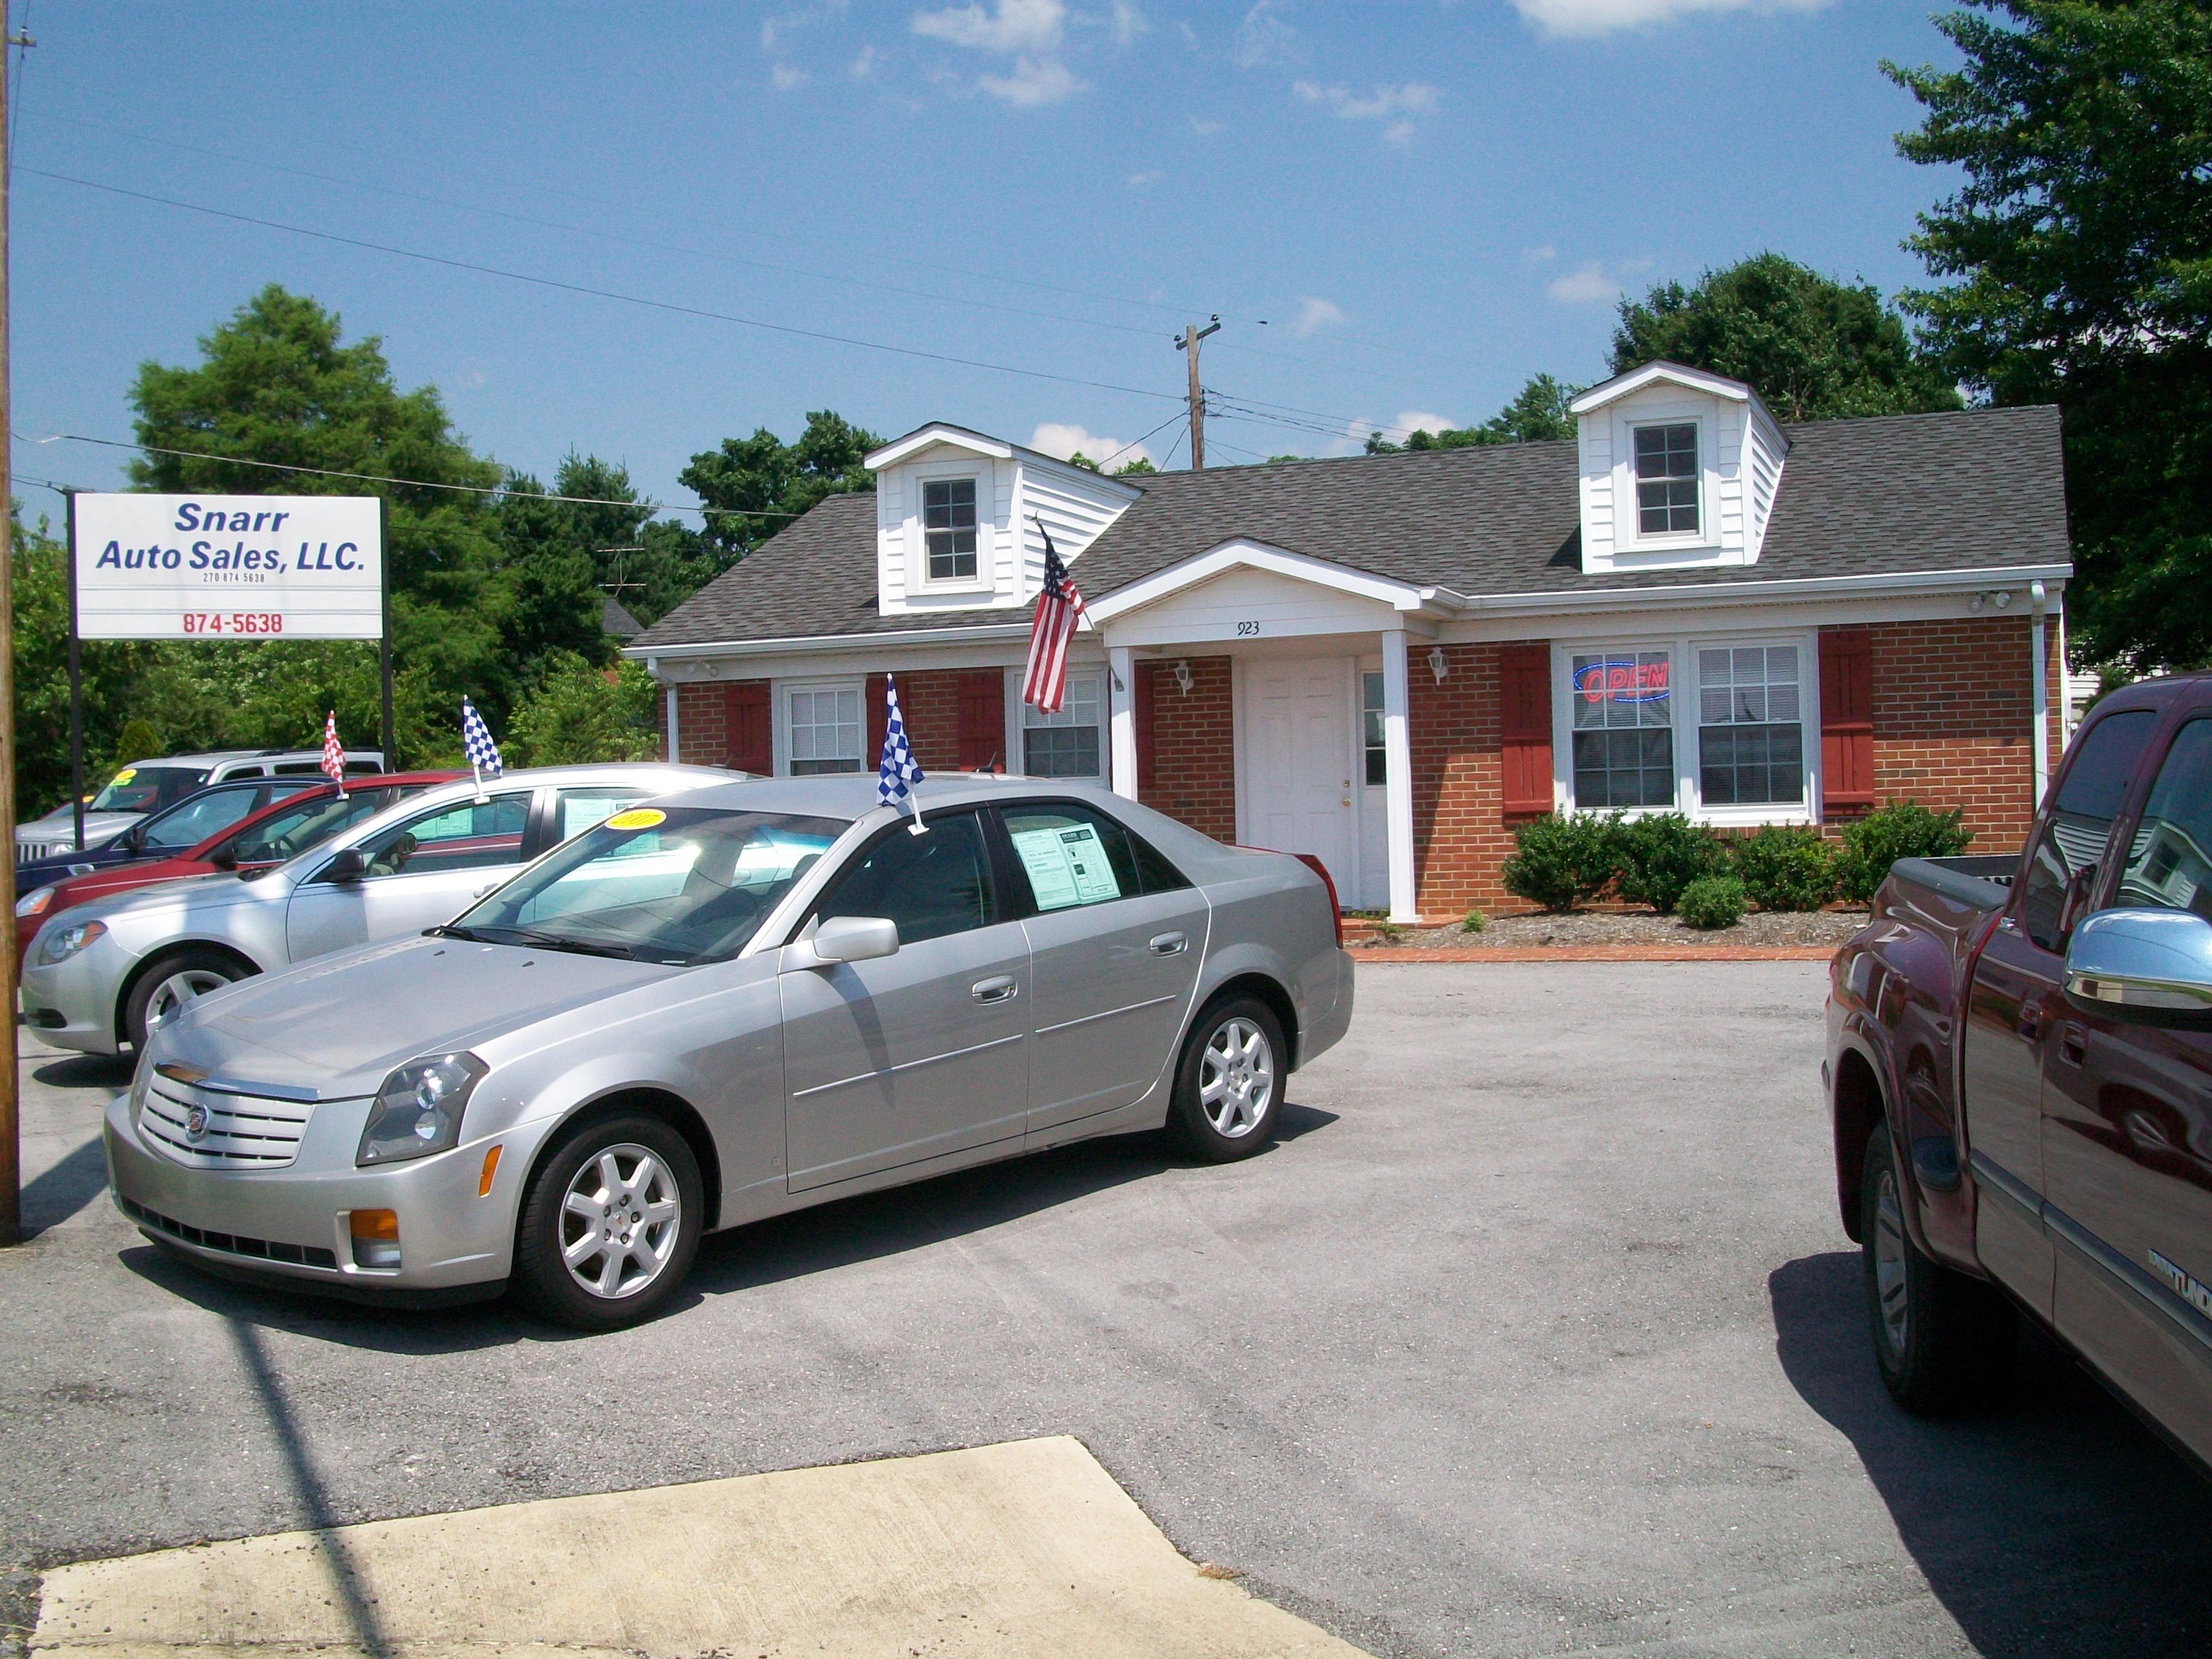 Snarr Auto Sales LLC, Hopkinsville KY